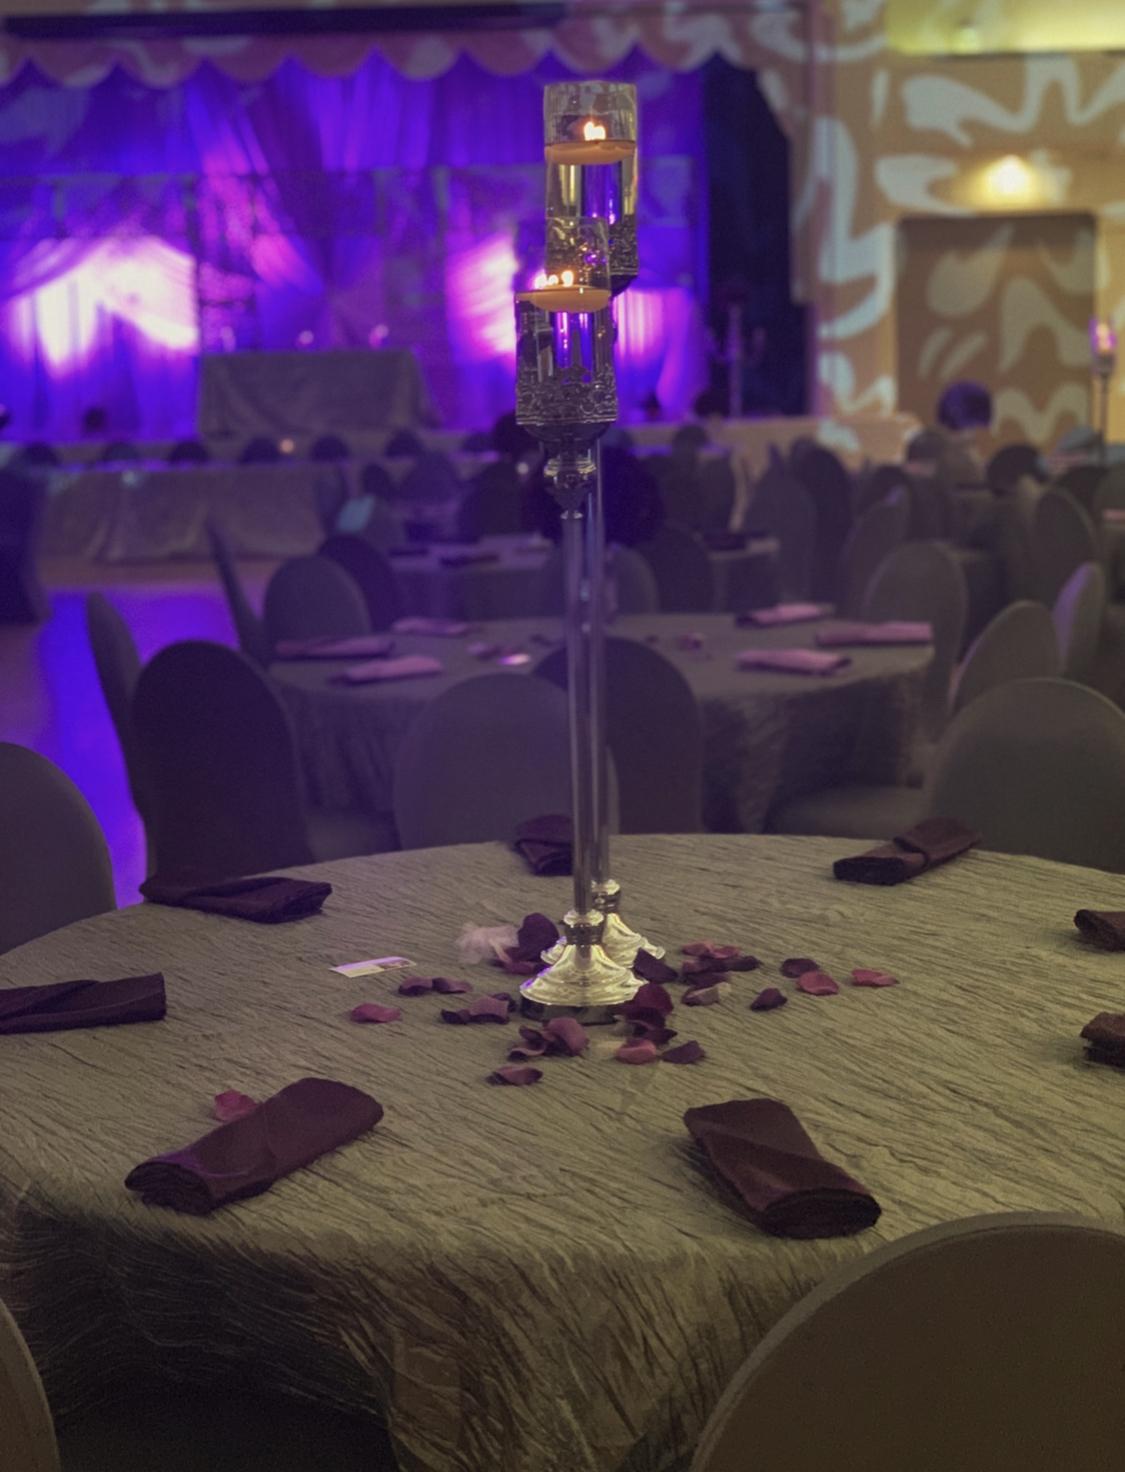 The Purple Wedding